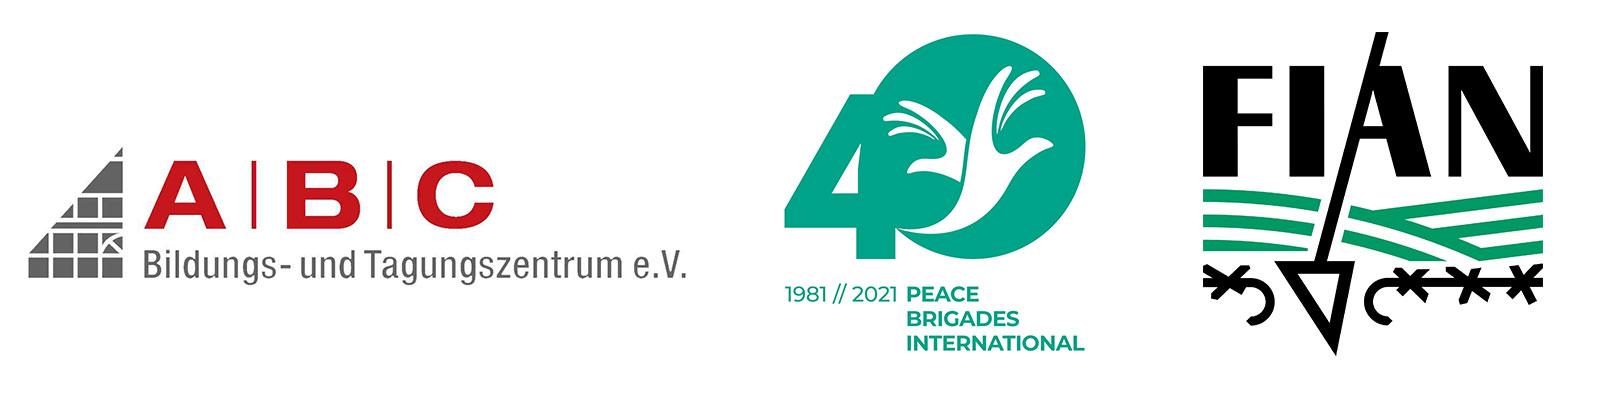 Logos_FIAN_pbi-Deutschland_ABC-Huell